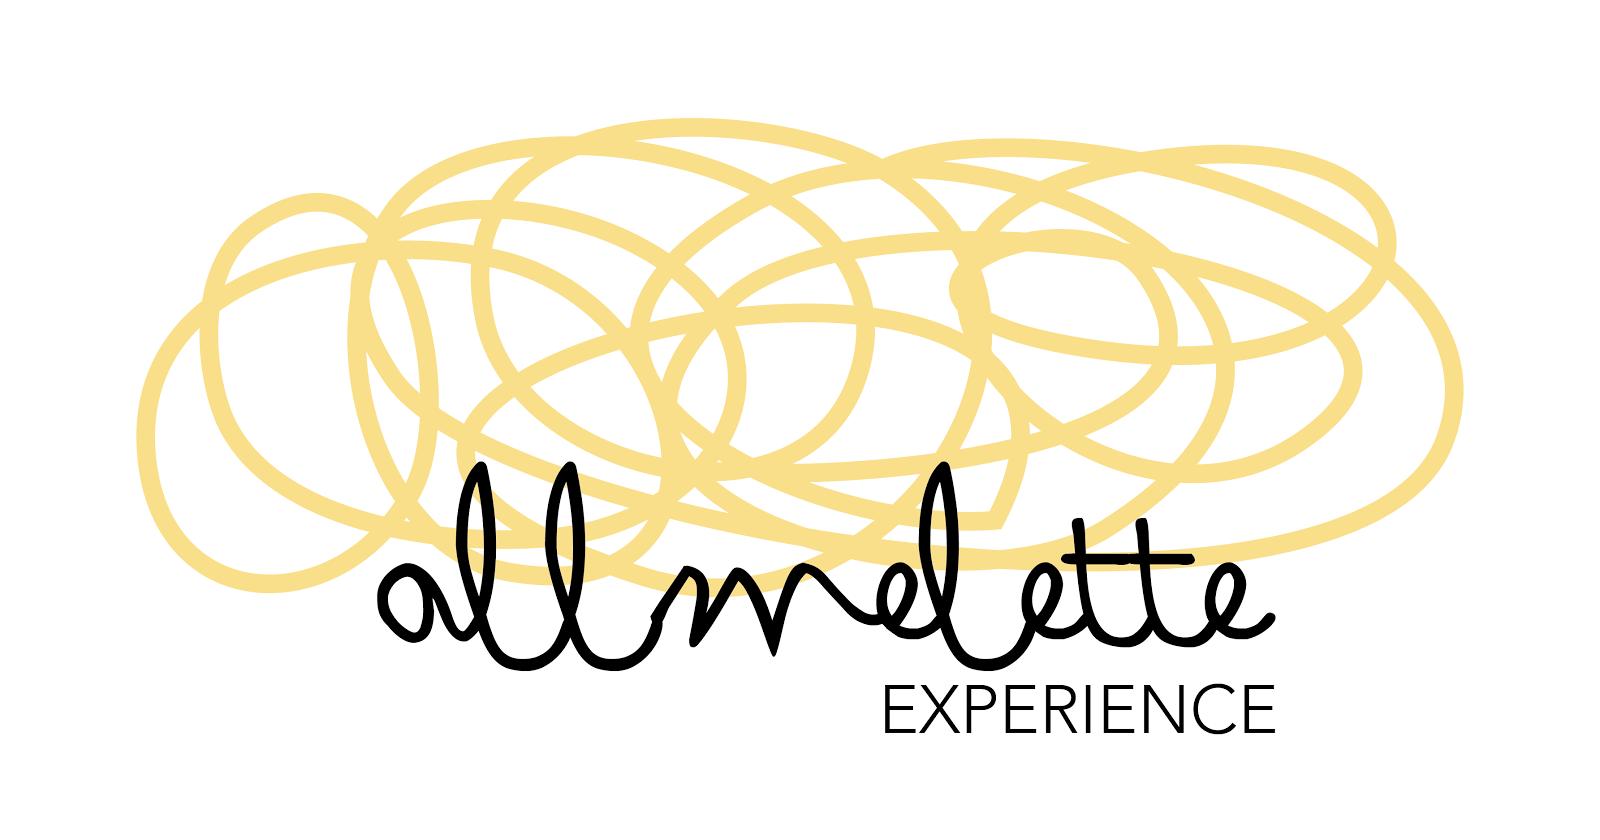 allmelette experience